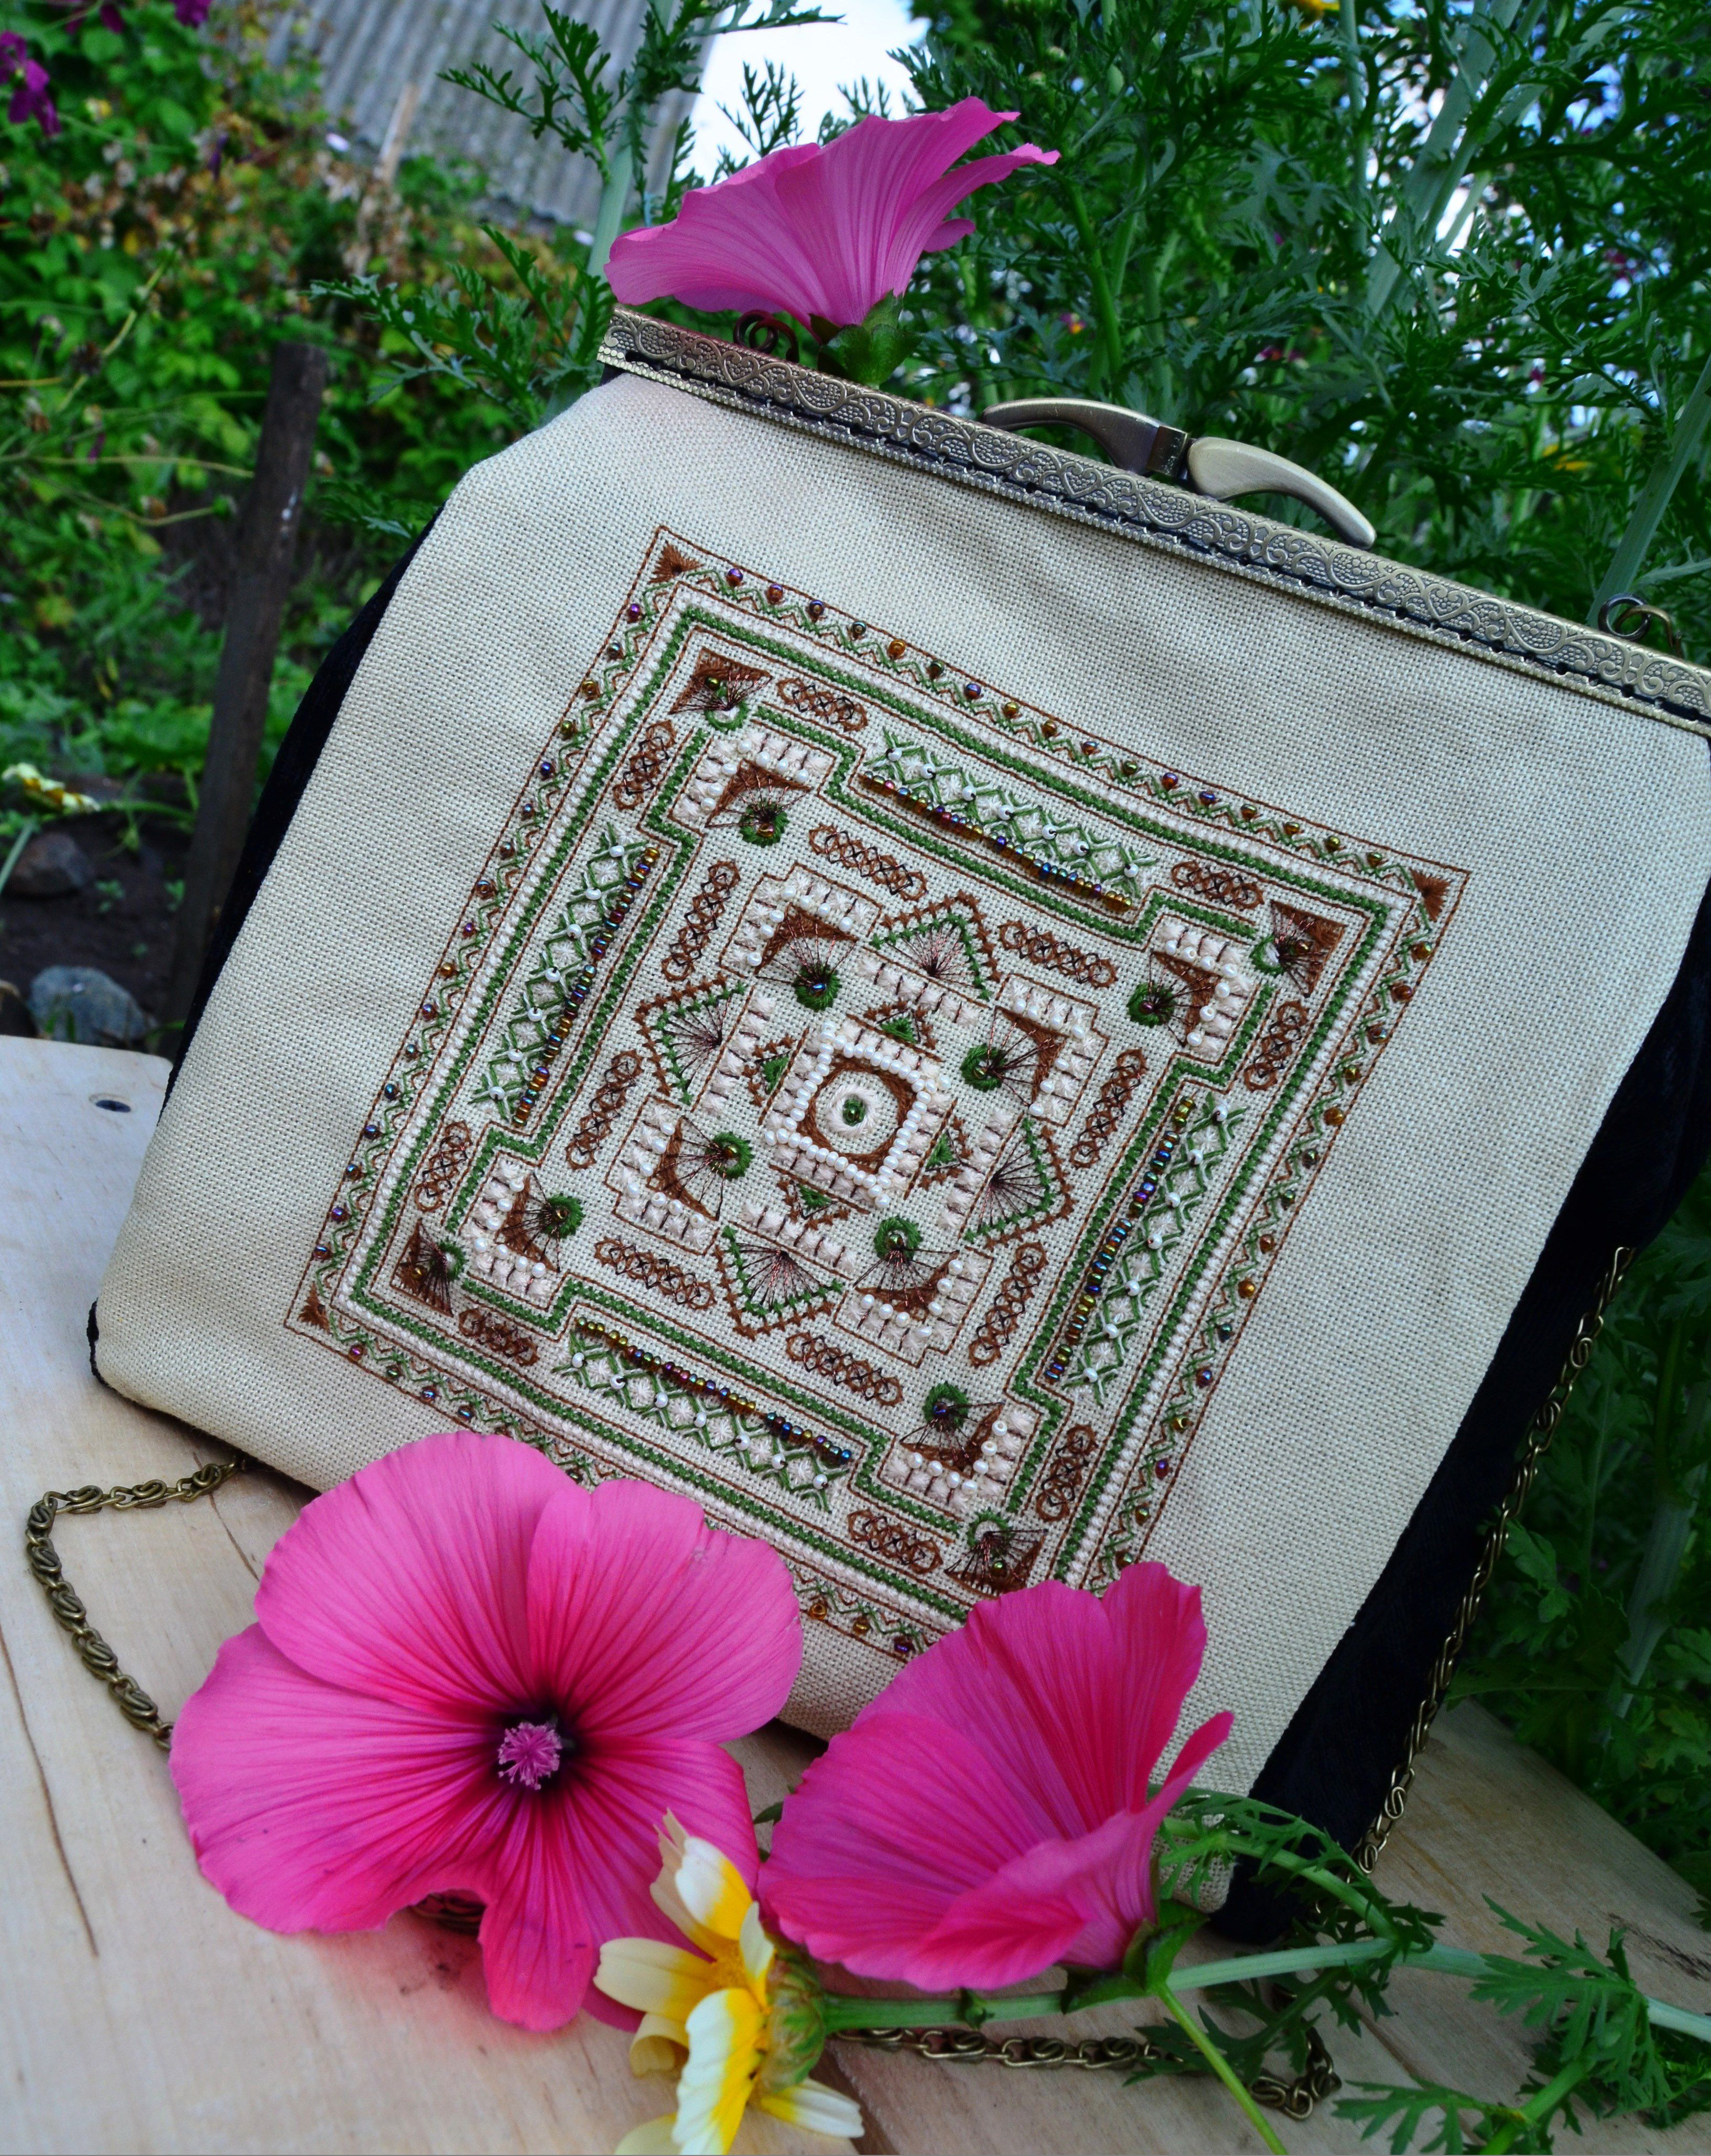 подарок фермуар вышивка вечер сумка